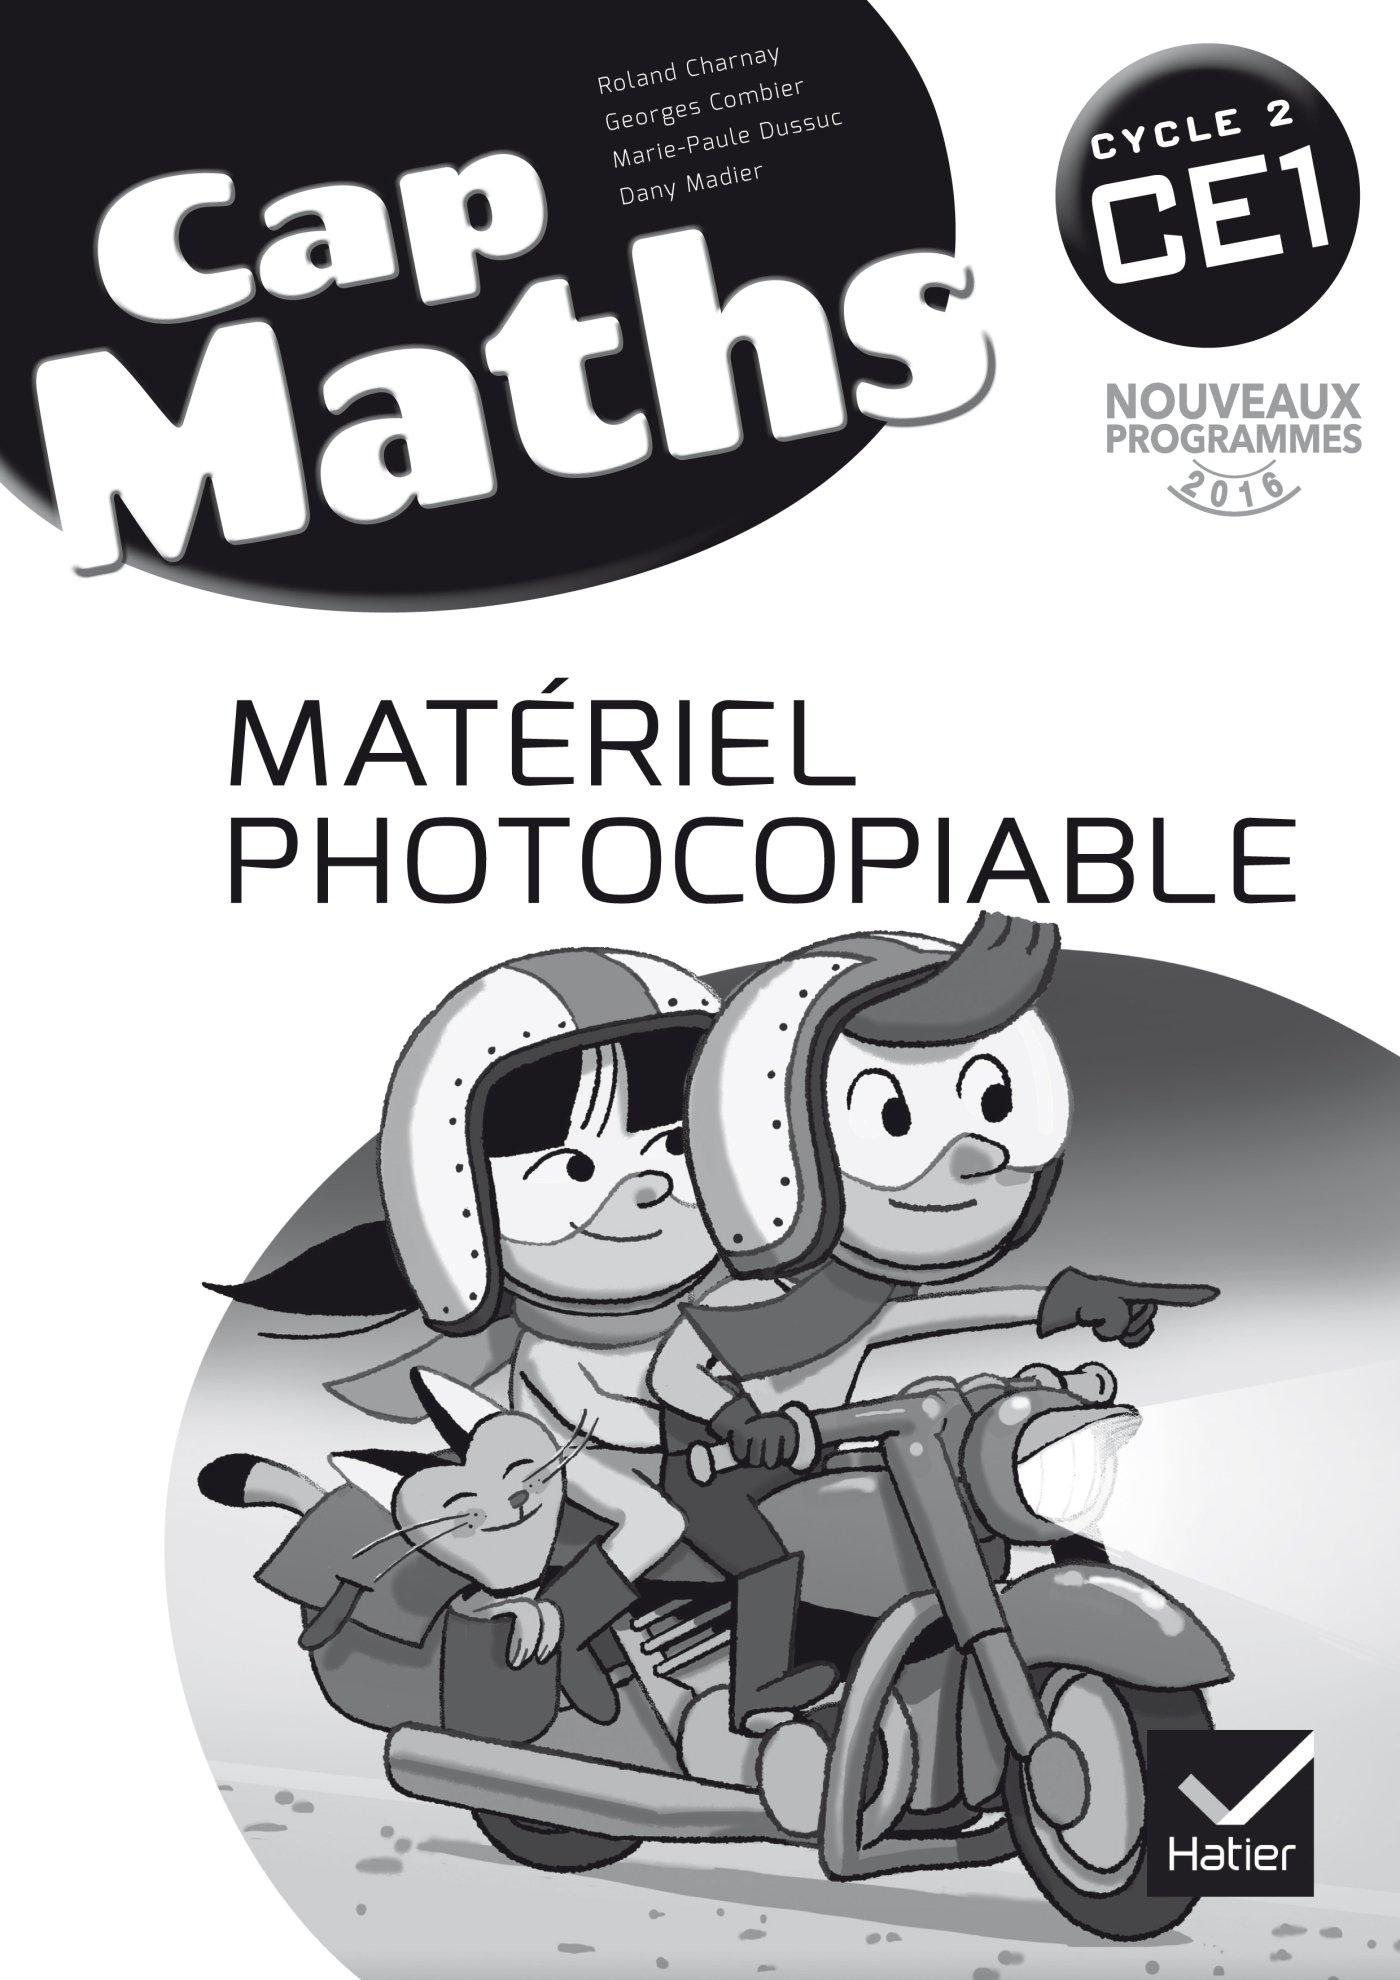 Cap Maths CE1 cycle 2 - éd. 2016 - Matériel photocopiable (French Edition) ebook